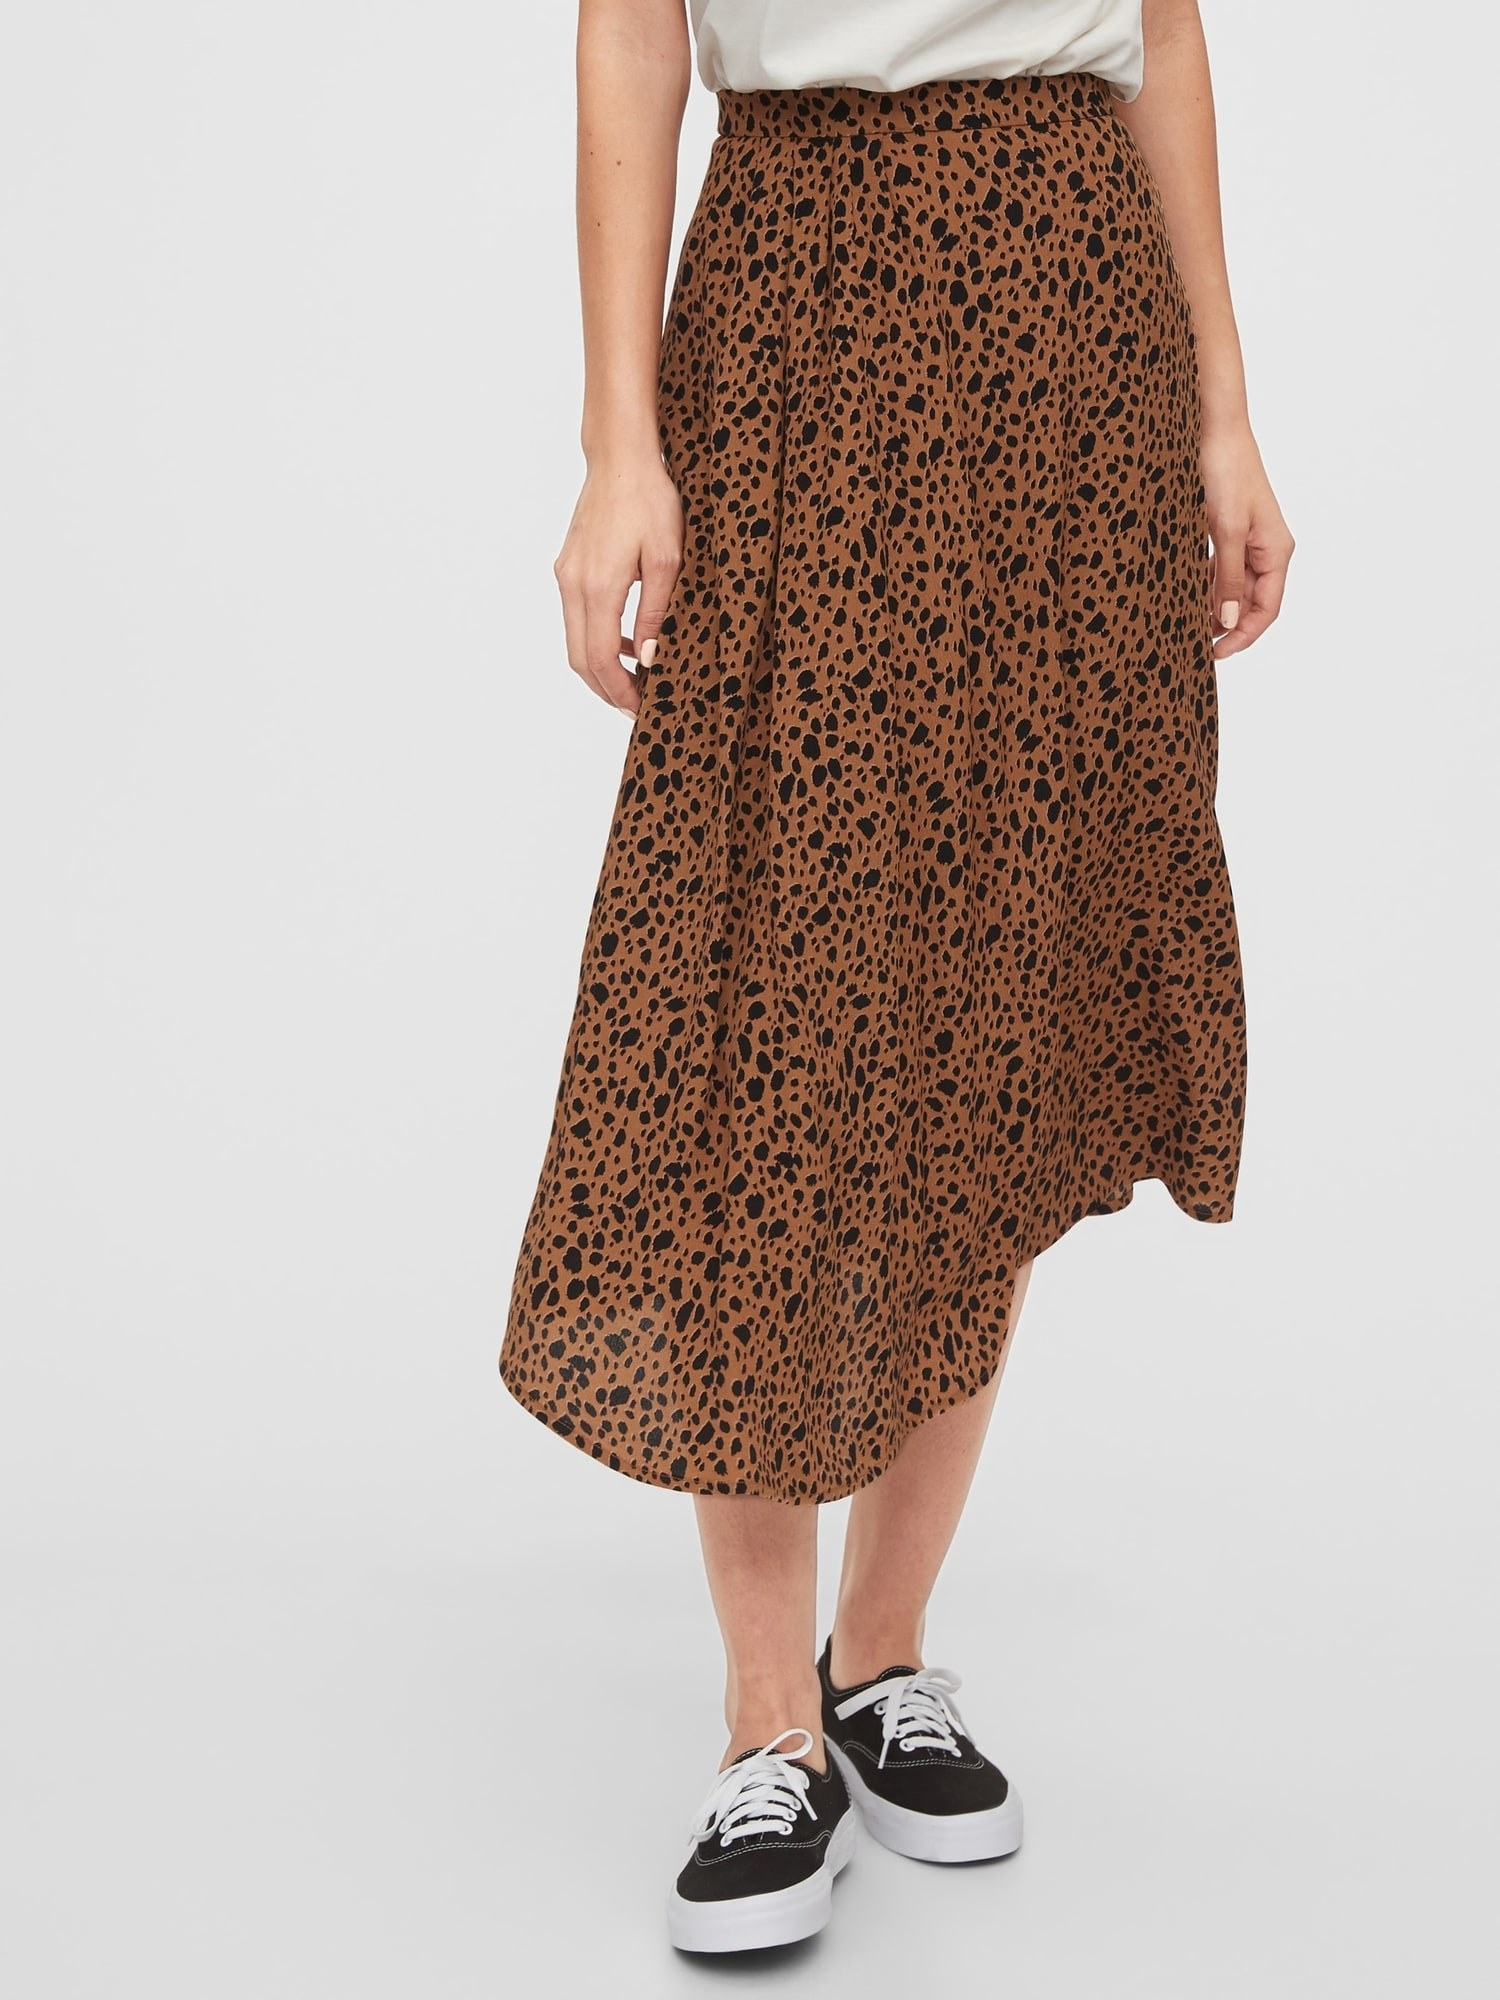 model wearing midi skirt in leopard print with black sneakers